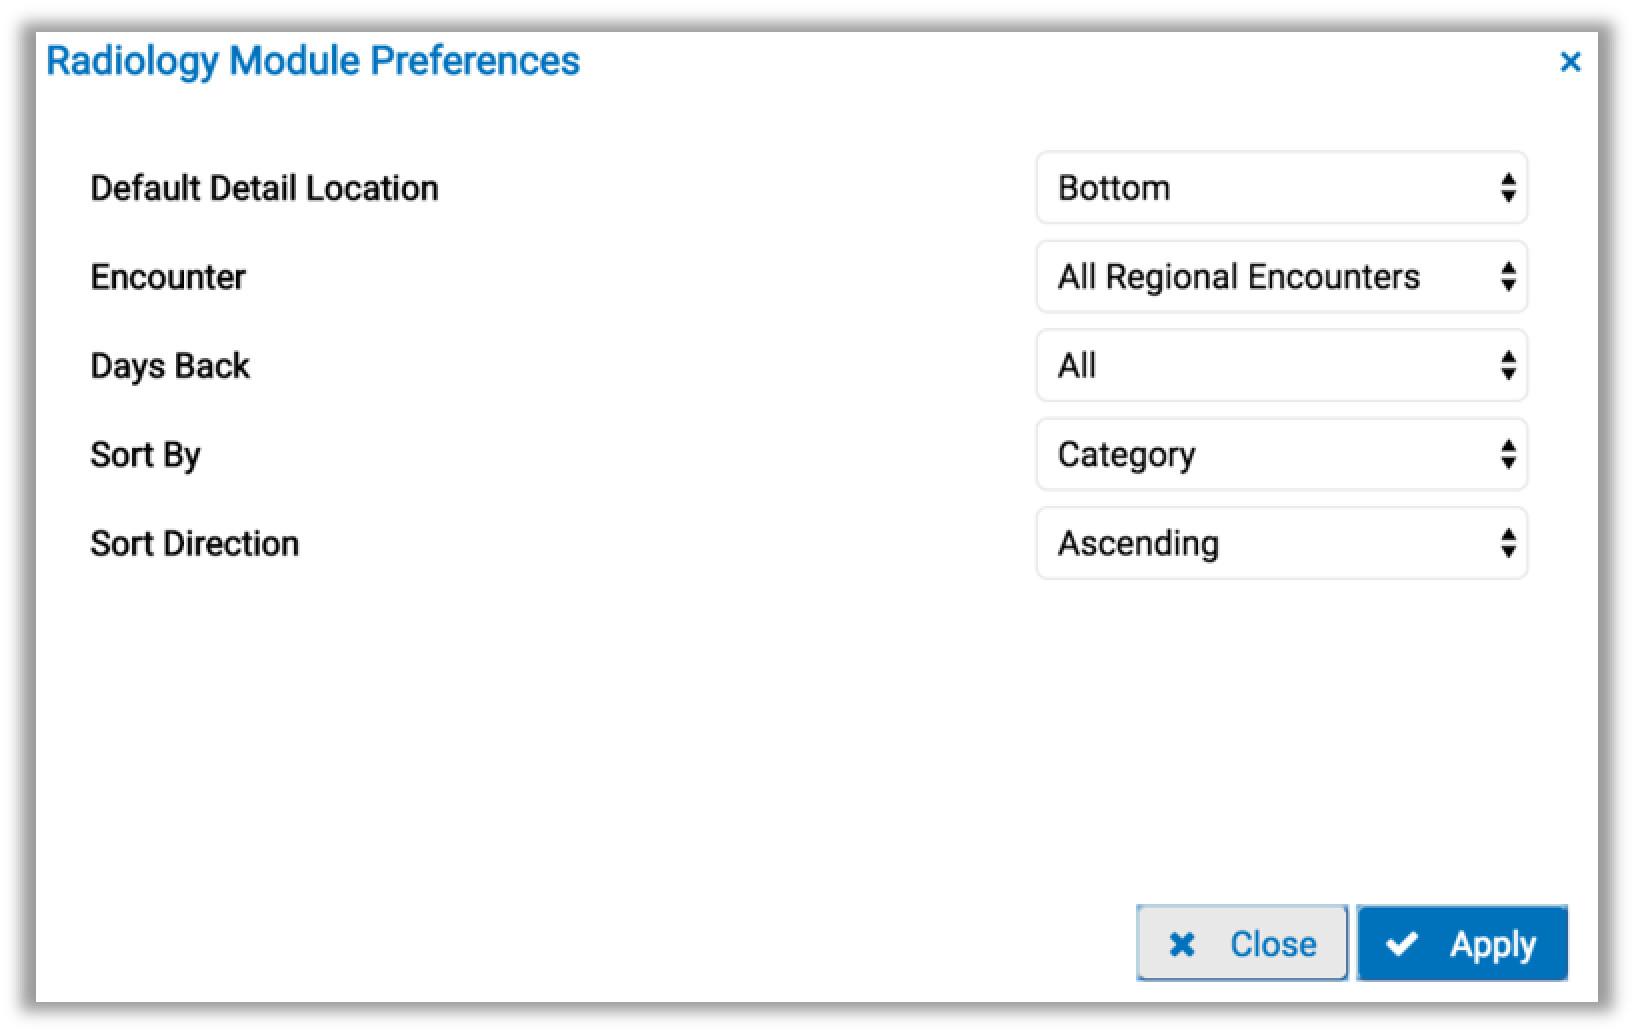 image od the preferences tab